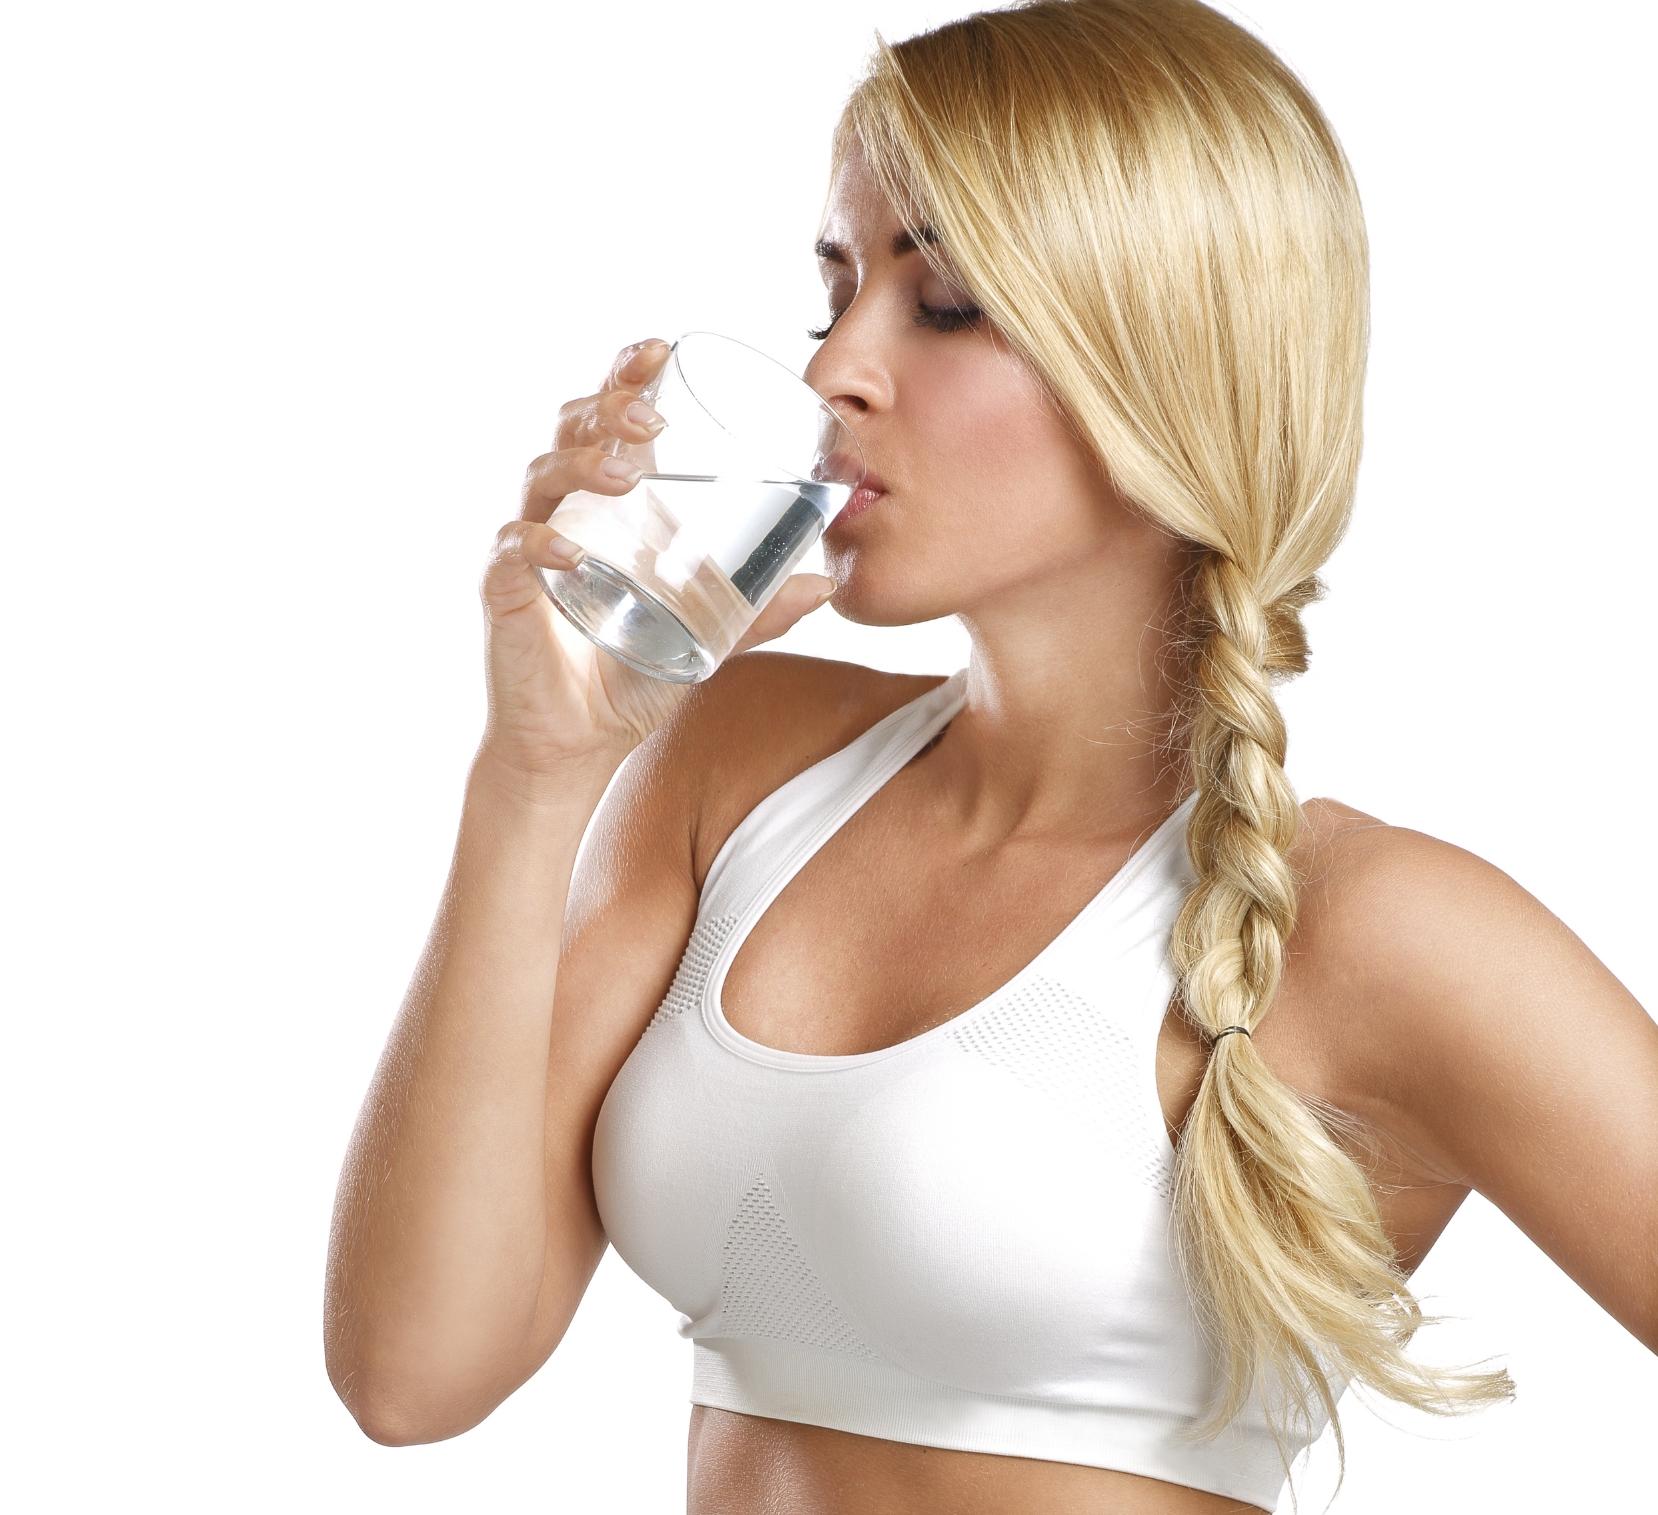 Drink lots of water!